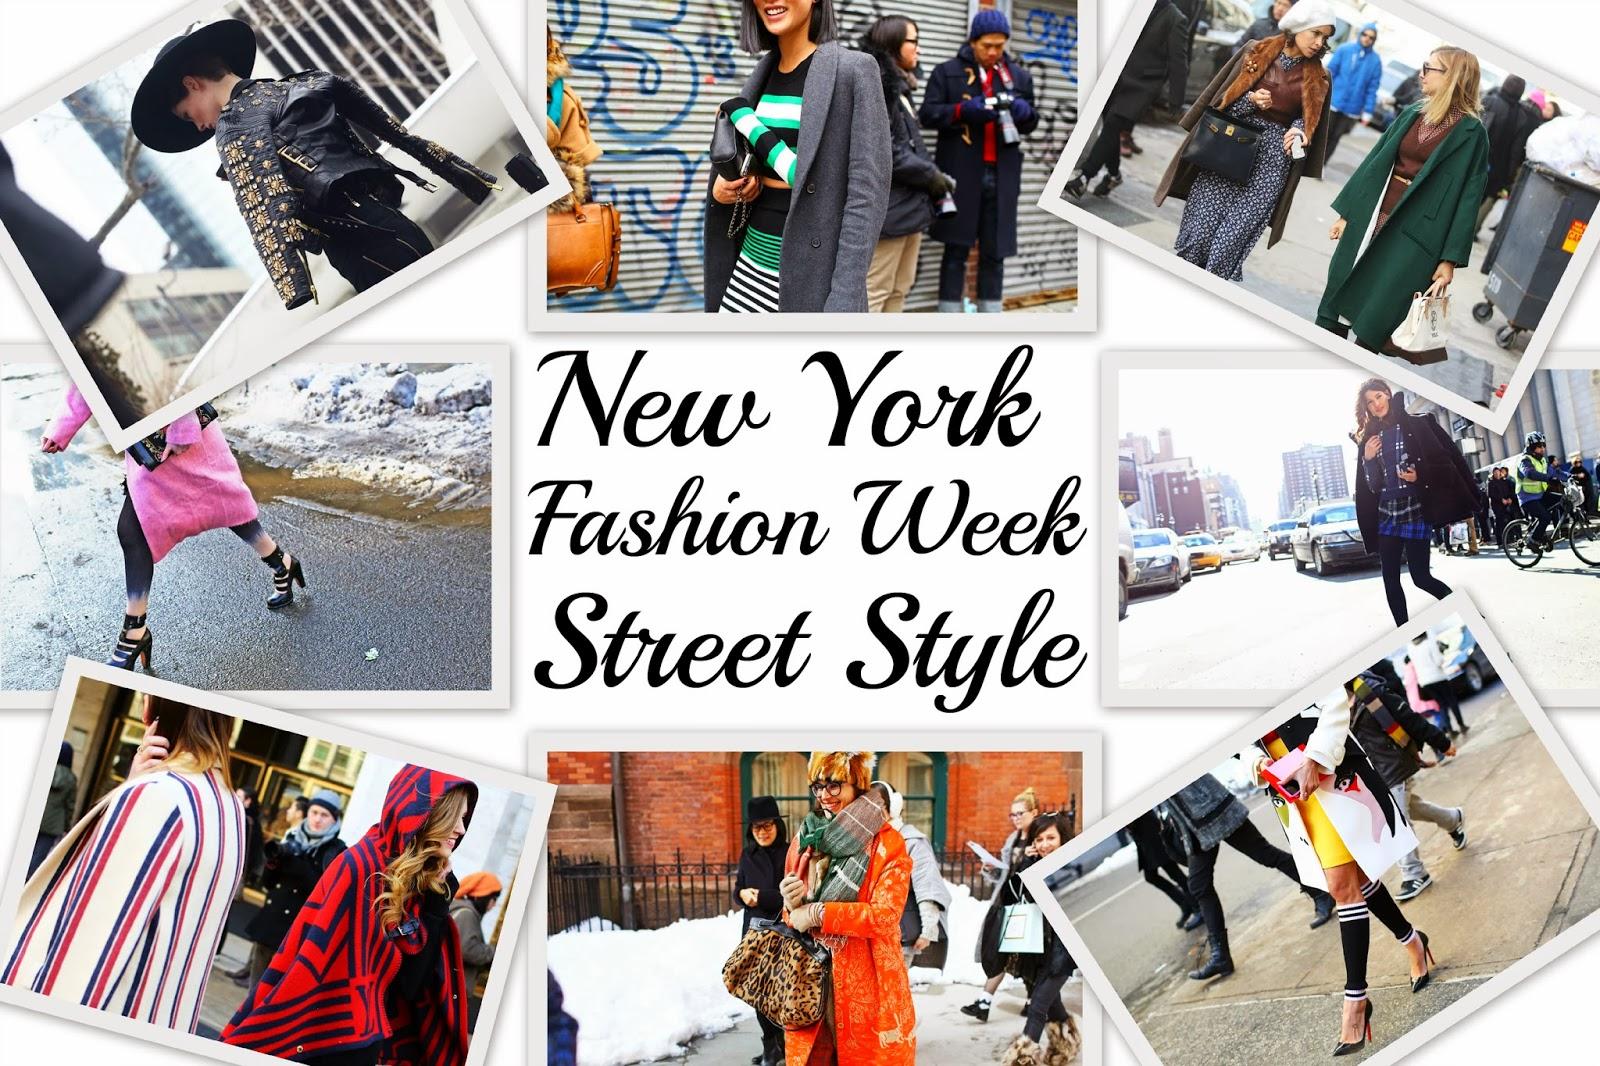 http://www.syriouslyinfashion.com/2014/02/new-york-fashion-week-street-style-show.html